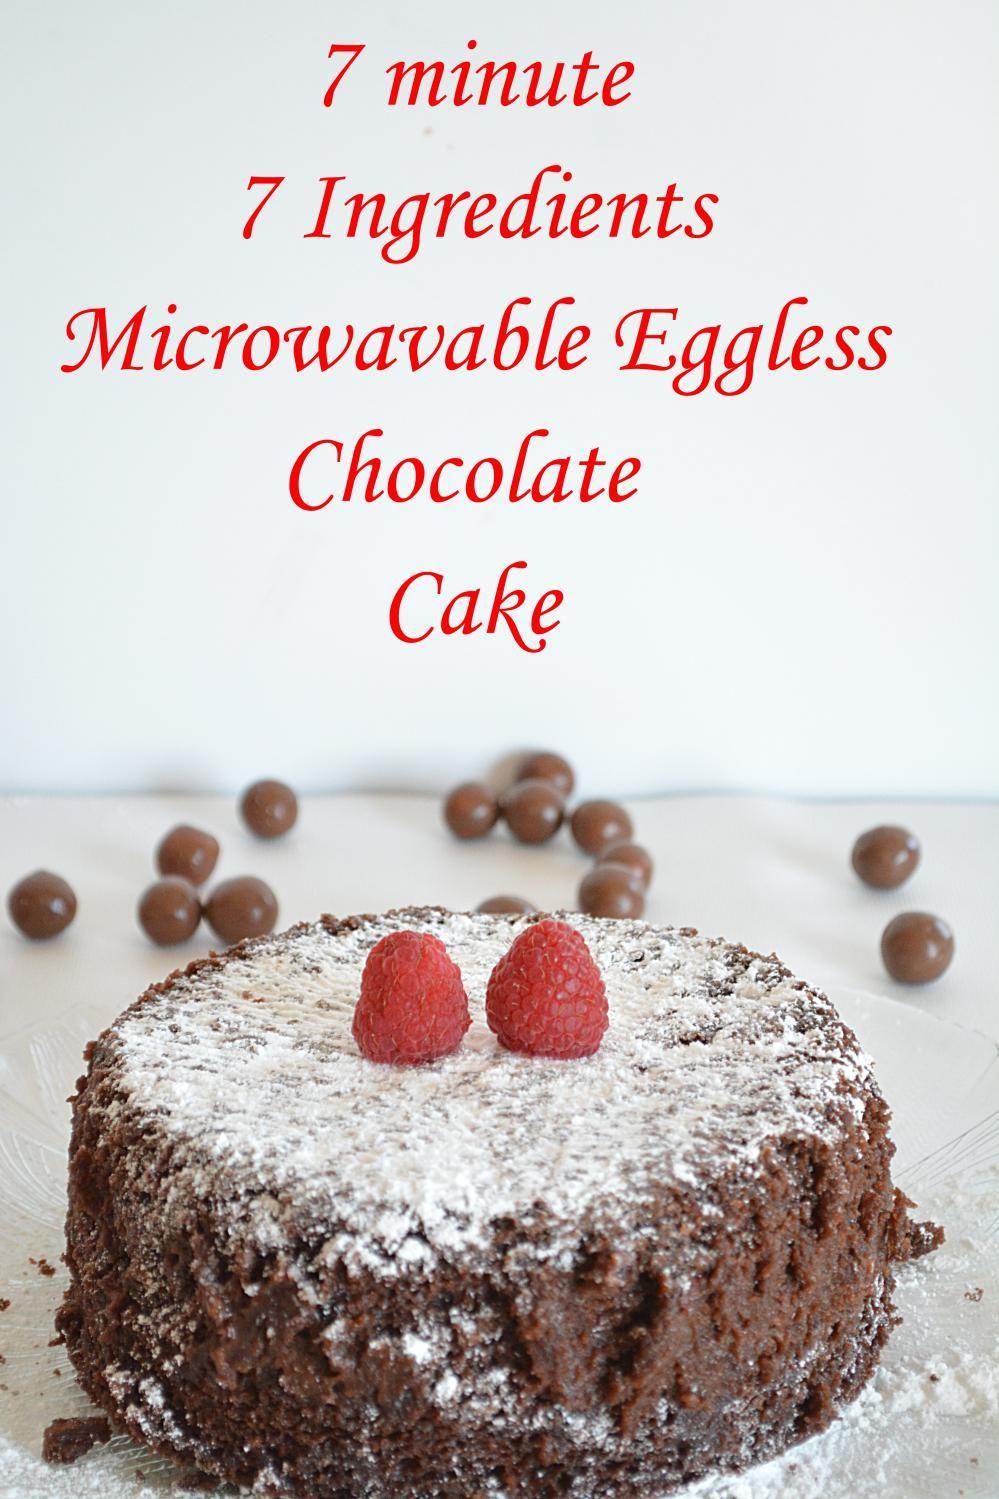 7 Minute Eggless Chocolate Cake Image Microwave Chocolate Cakes Eggless Chocolate Cake Microwave Cake